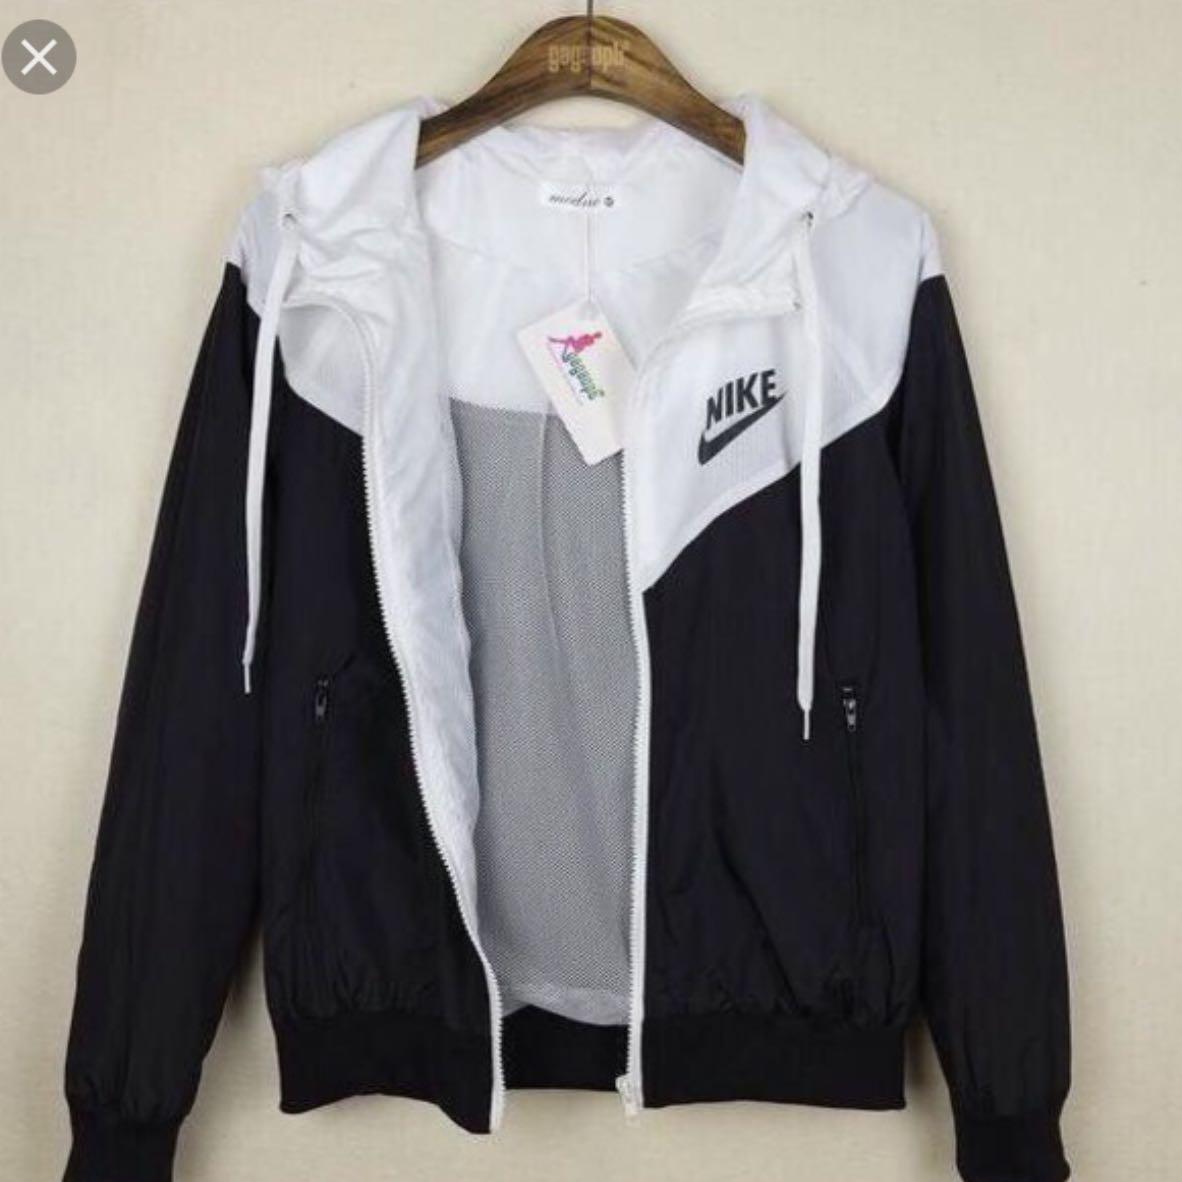 Wo bekomme ich diese Nike Windbreaker Jackeher? (Mode